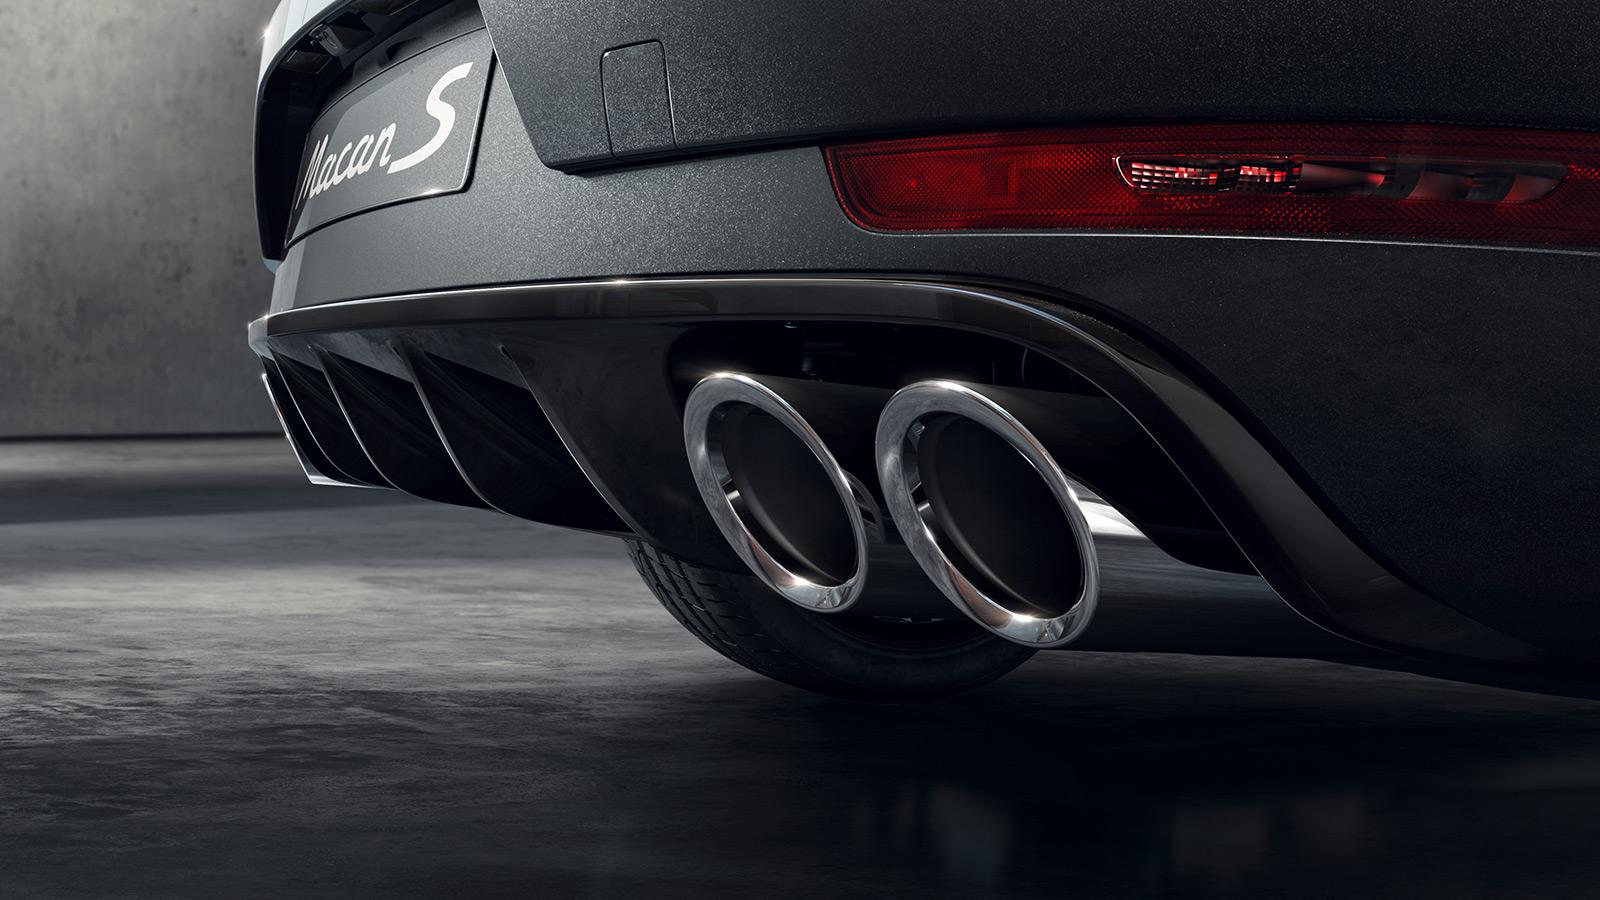 Porsche - Échappements sport et sorties d'échappement sport